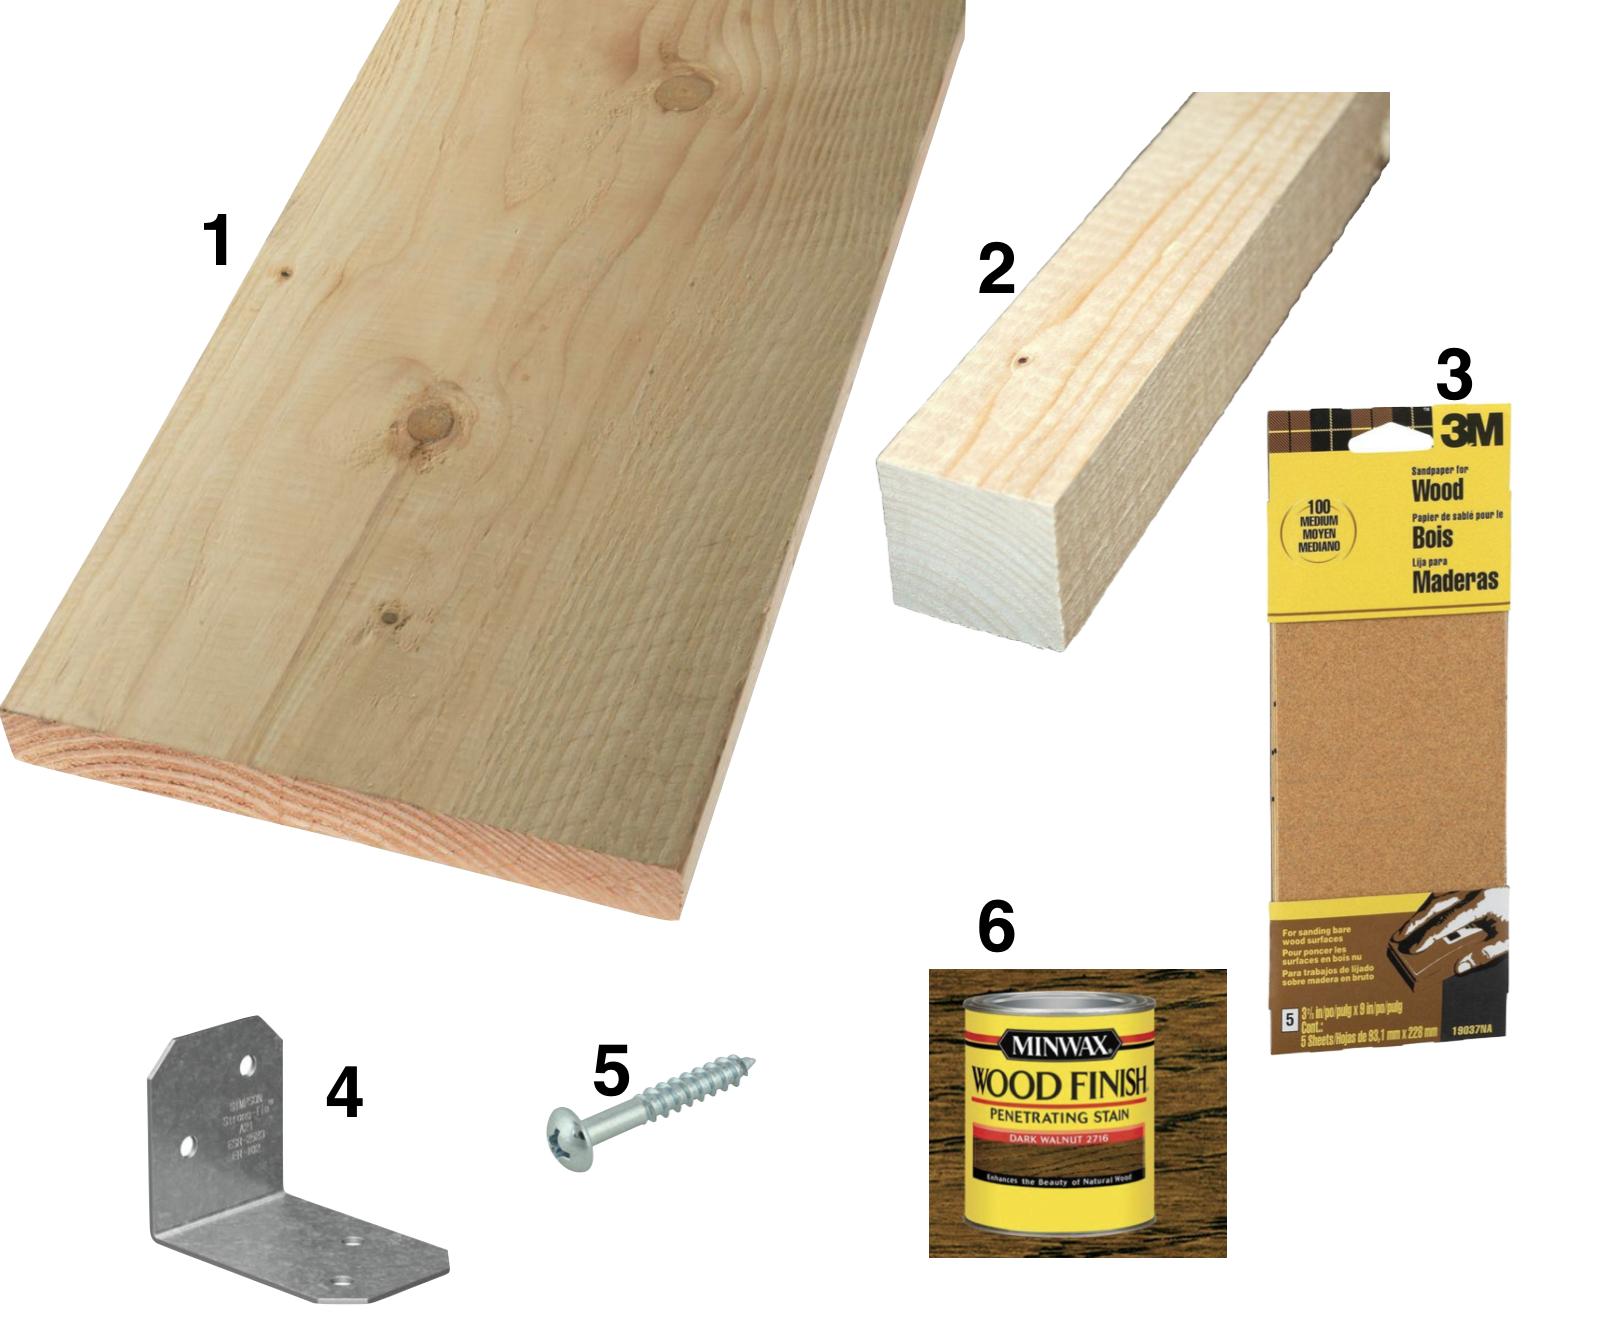 DIY wood bench supplies